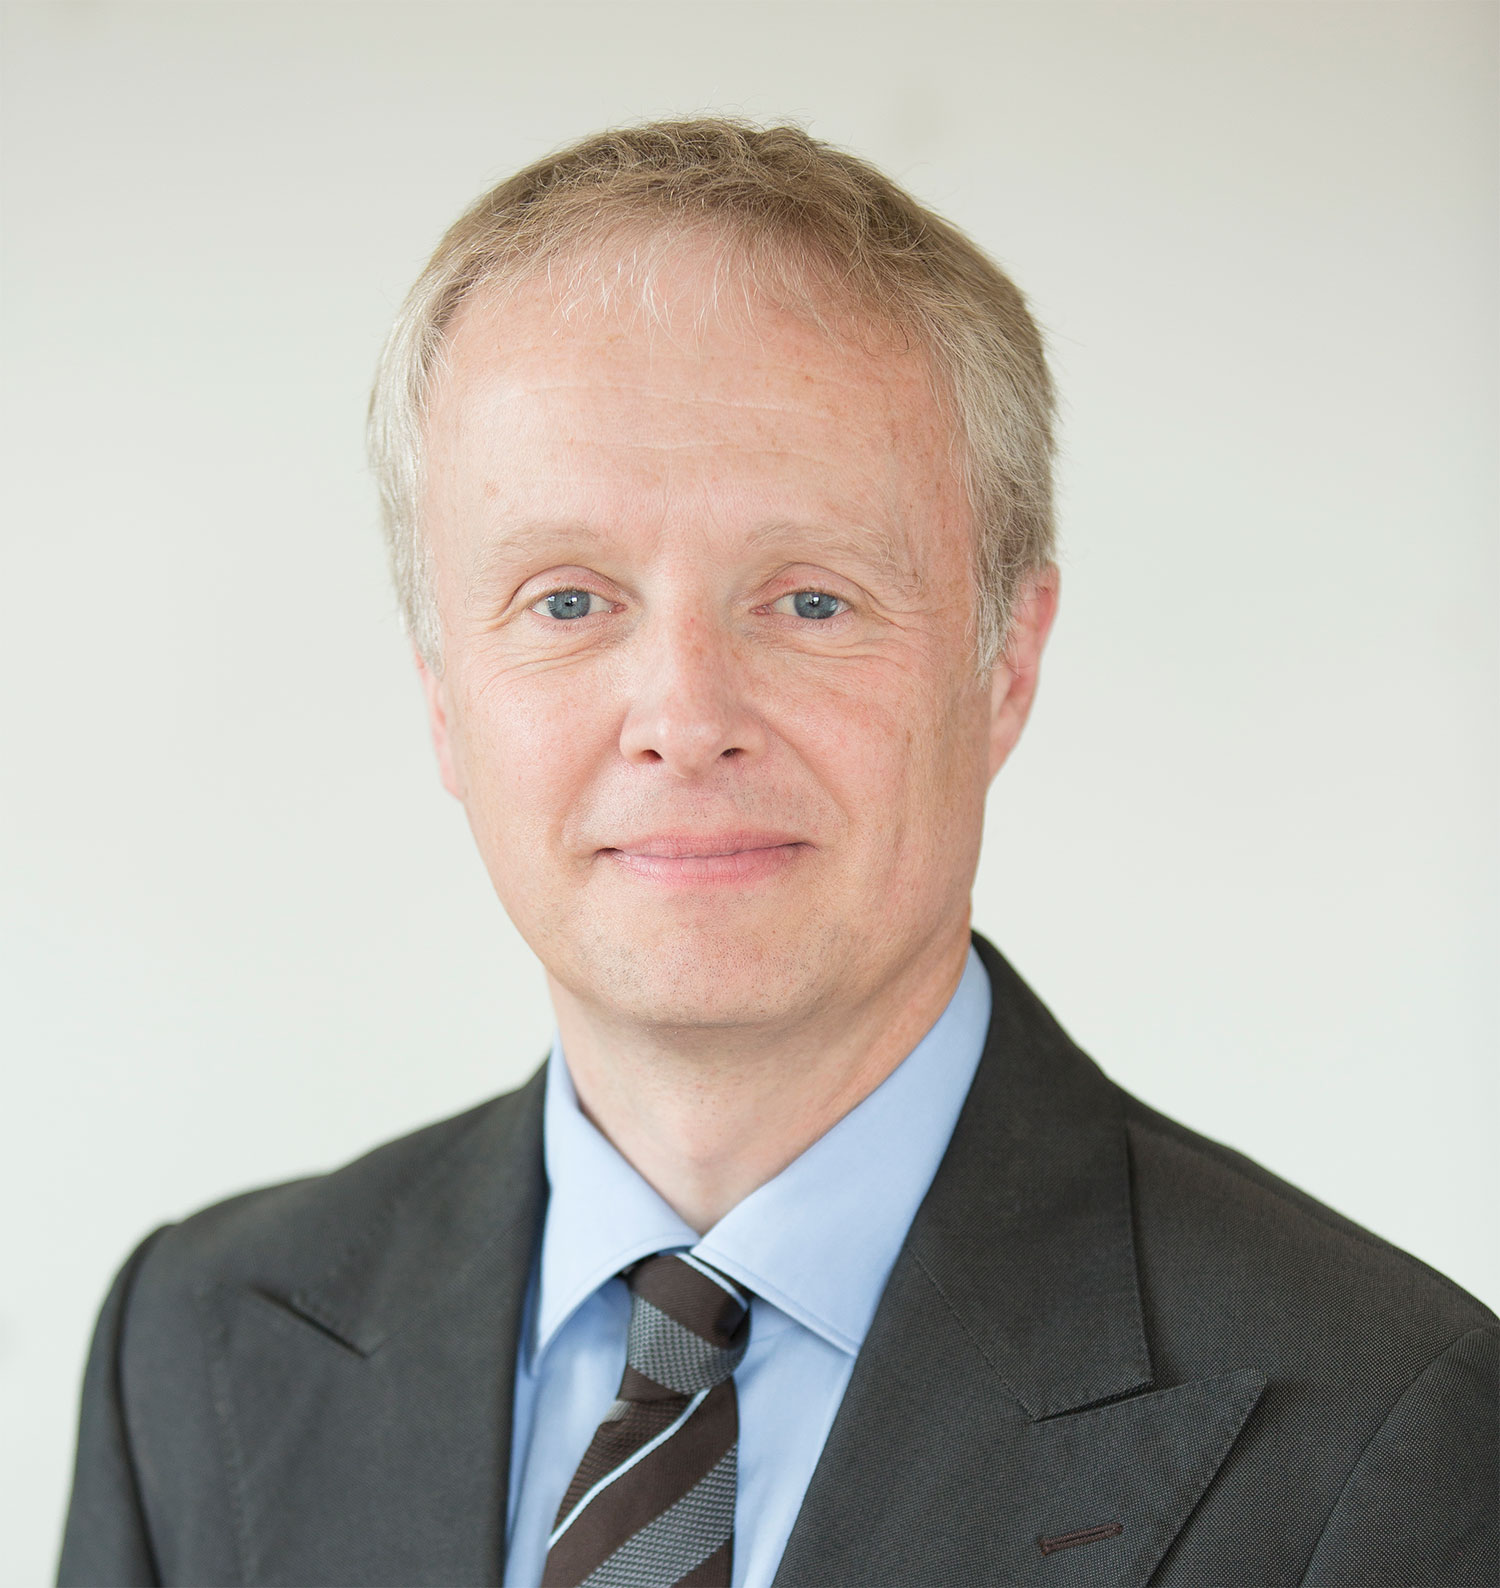 neill-anderson-financial-adviser-in-clydebank